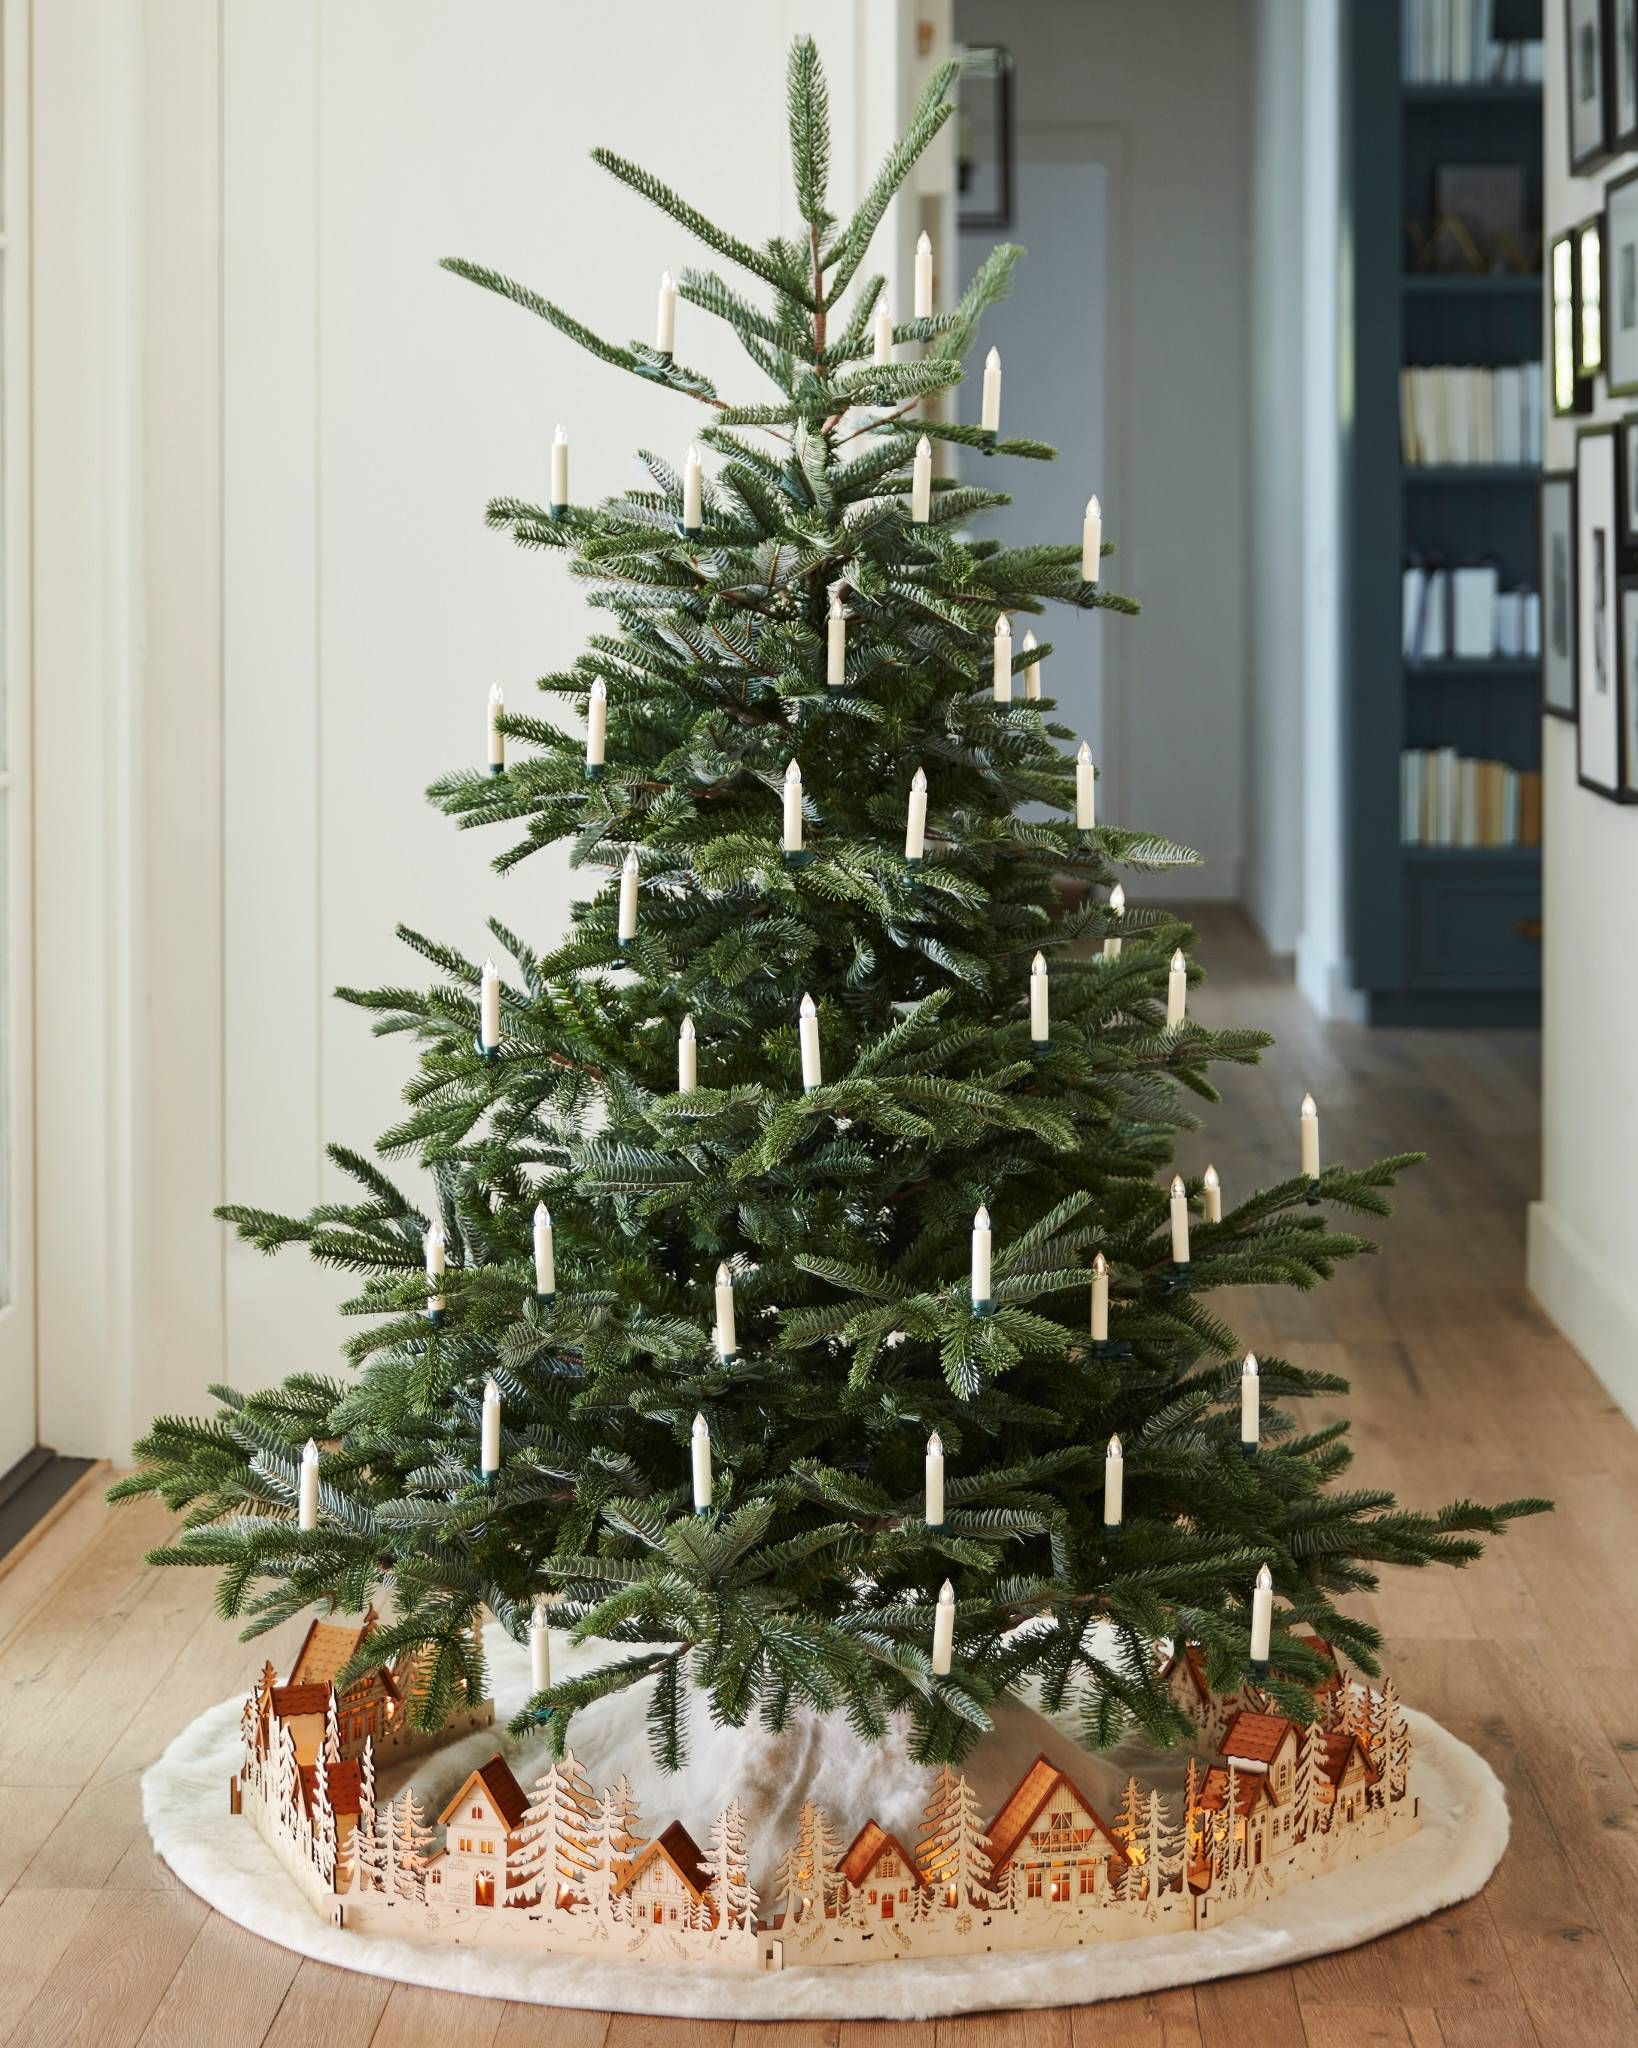 European Fir Artificial Christmas Tree Balsam Hill Christmas Tree Candles Led Christmas Tree Fir Christmas Tree